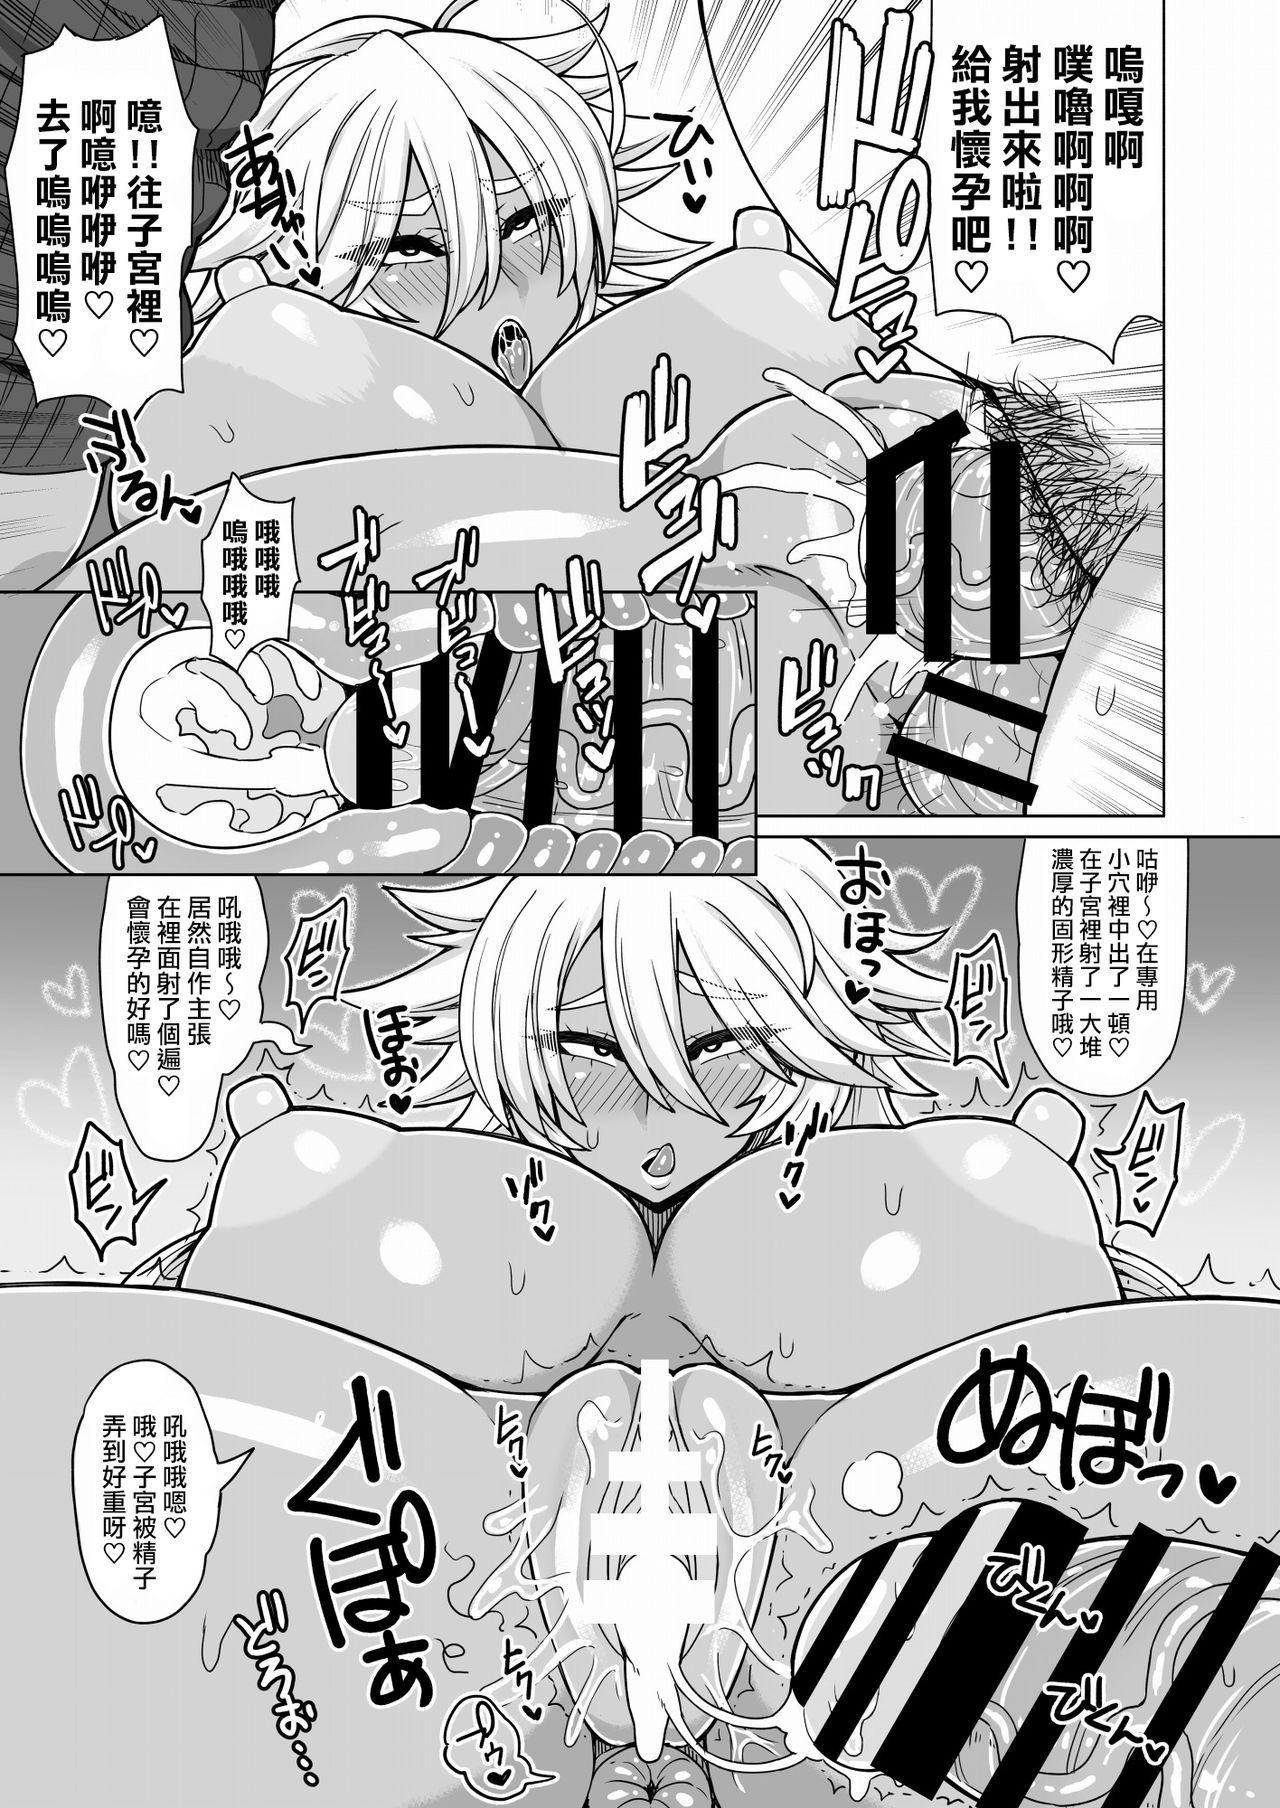 Futari no Kuro Gal Yankee | 兩個不良黑皮辣妹 17